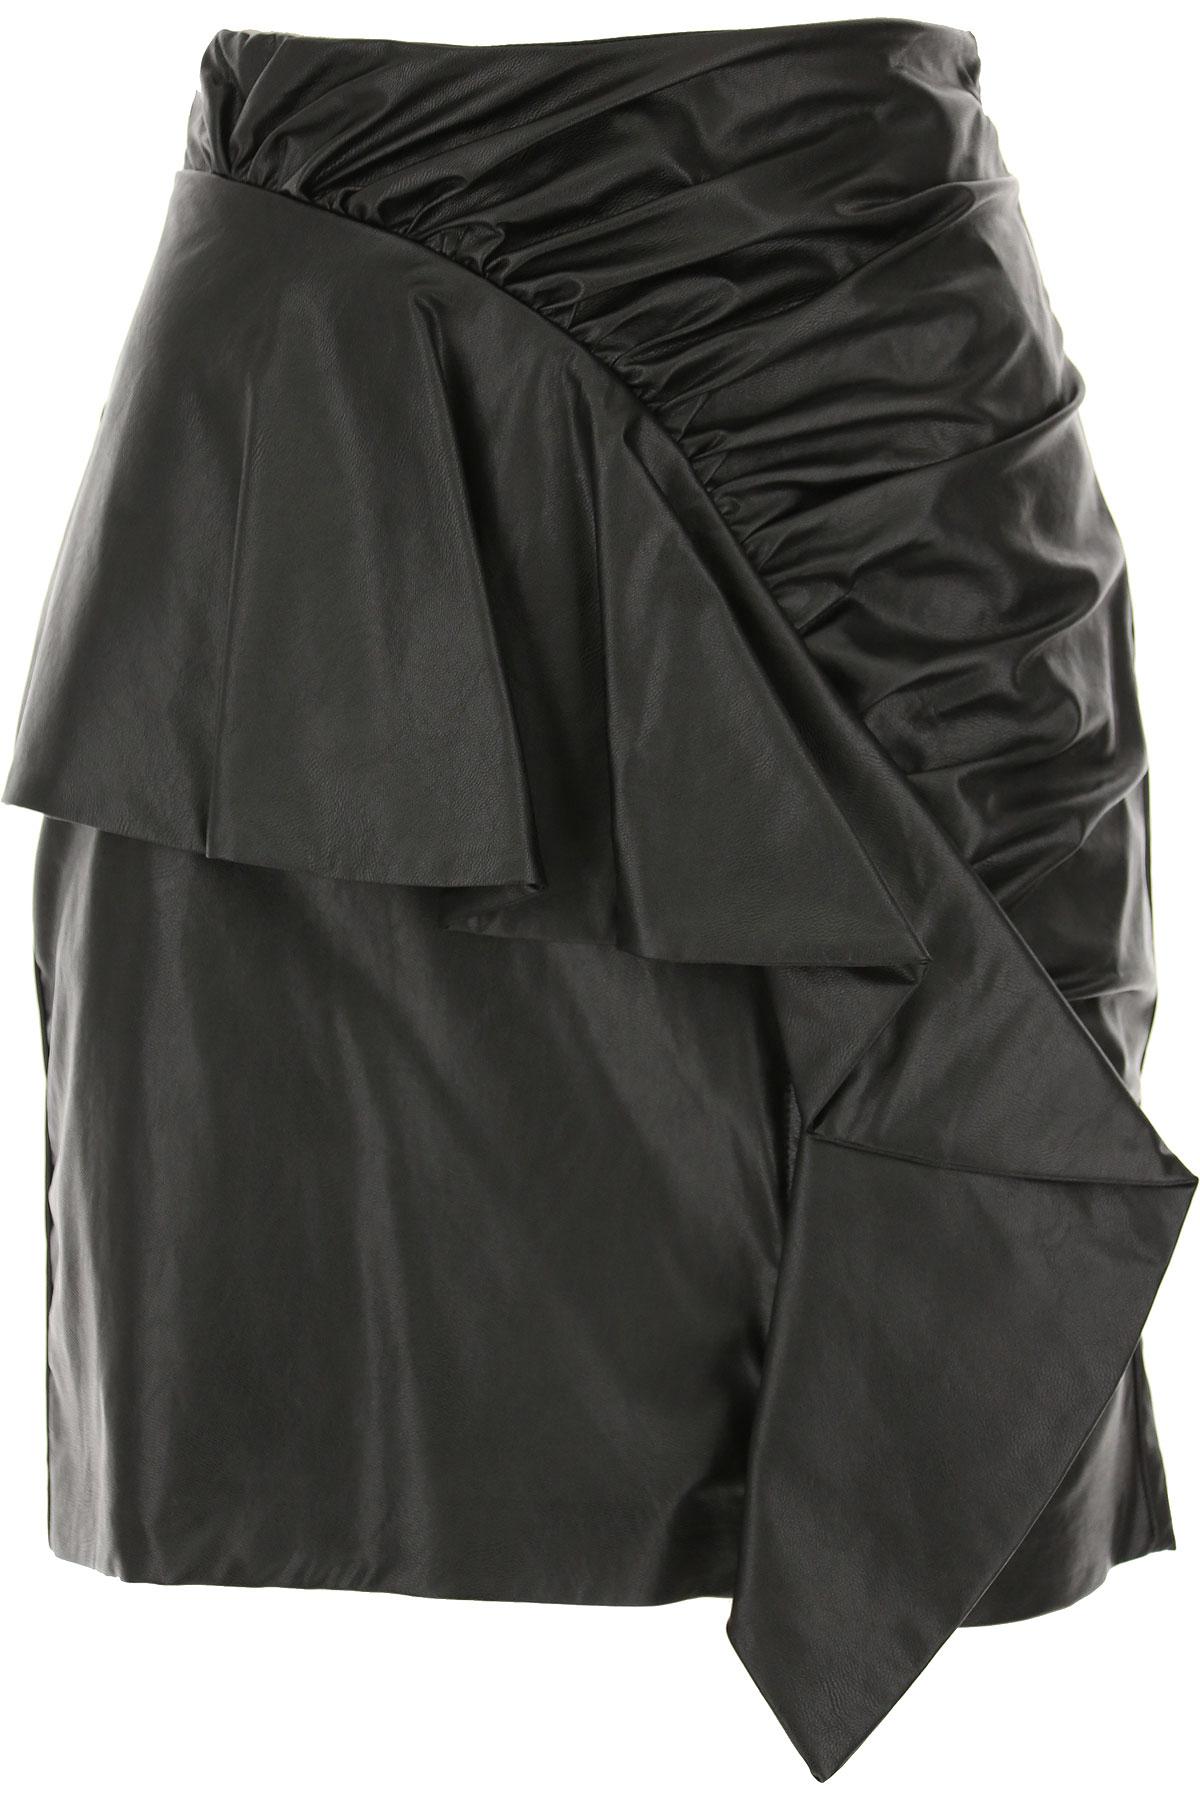 Aniye By Skirt for Women On Sale, Black, Viscose, 2019, 2 4 6